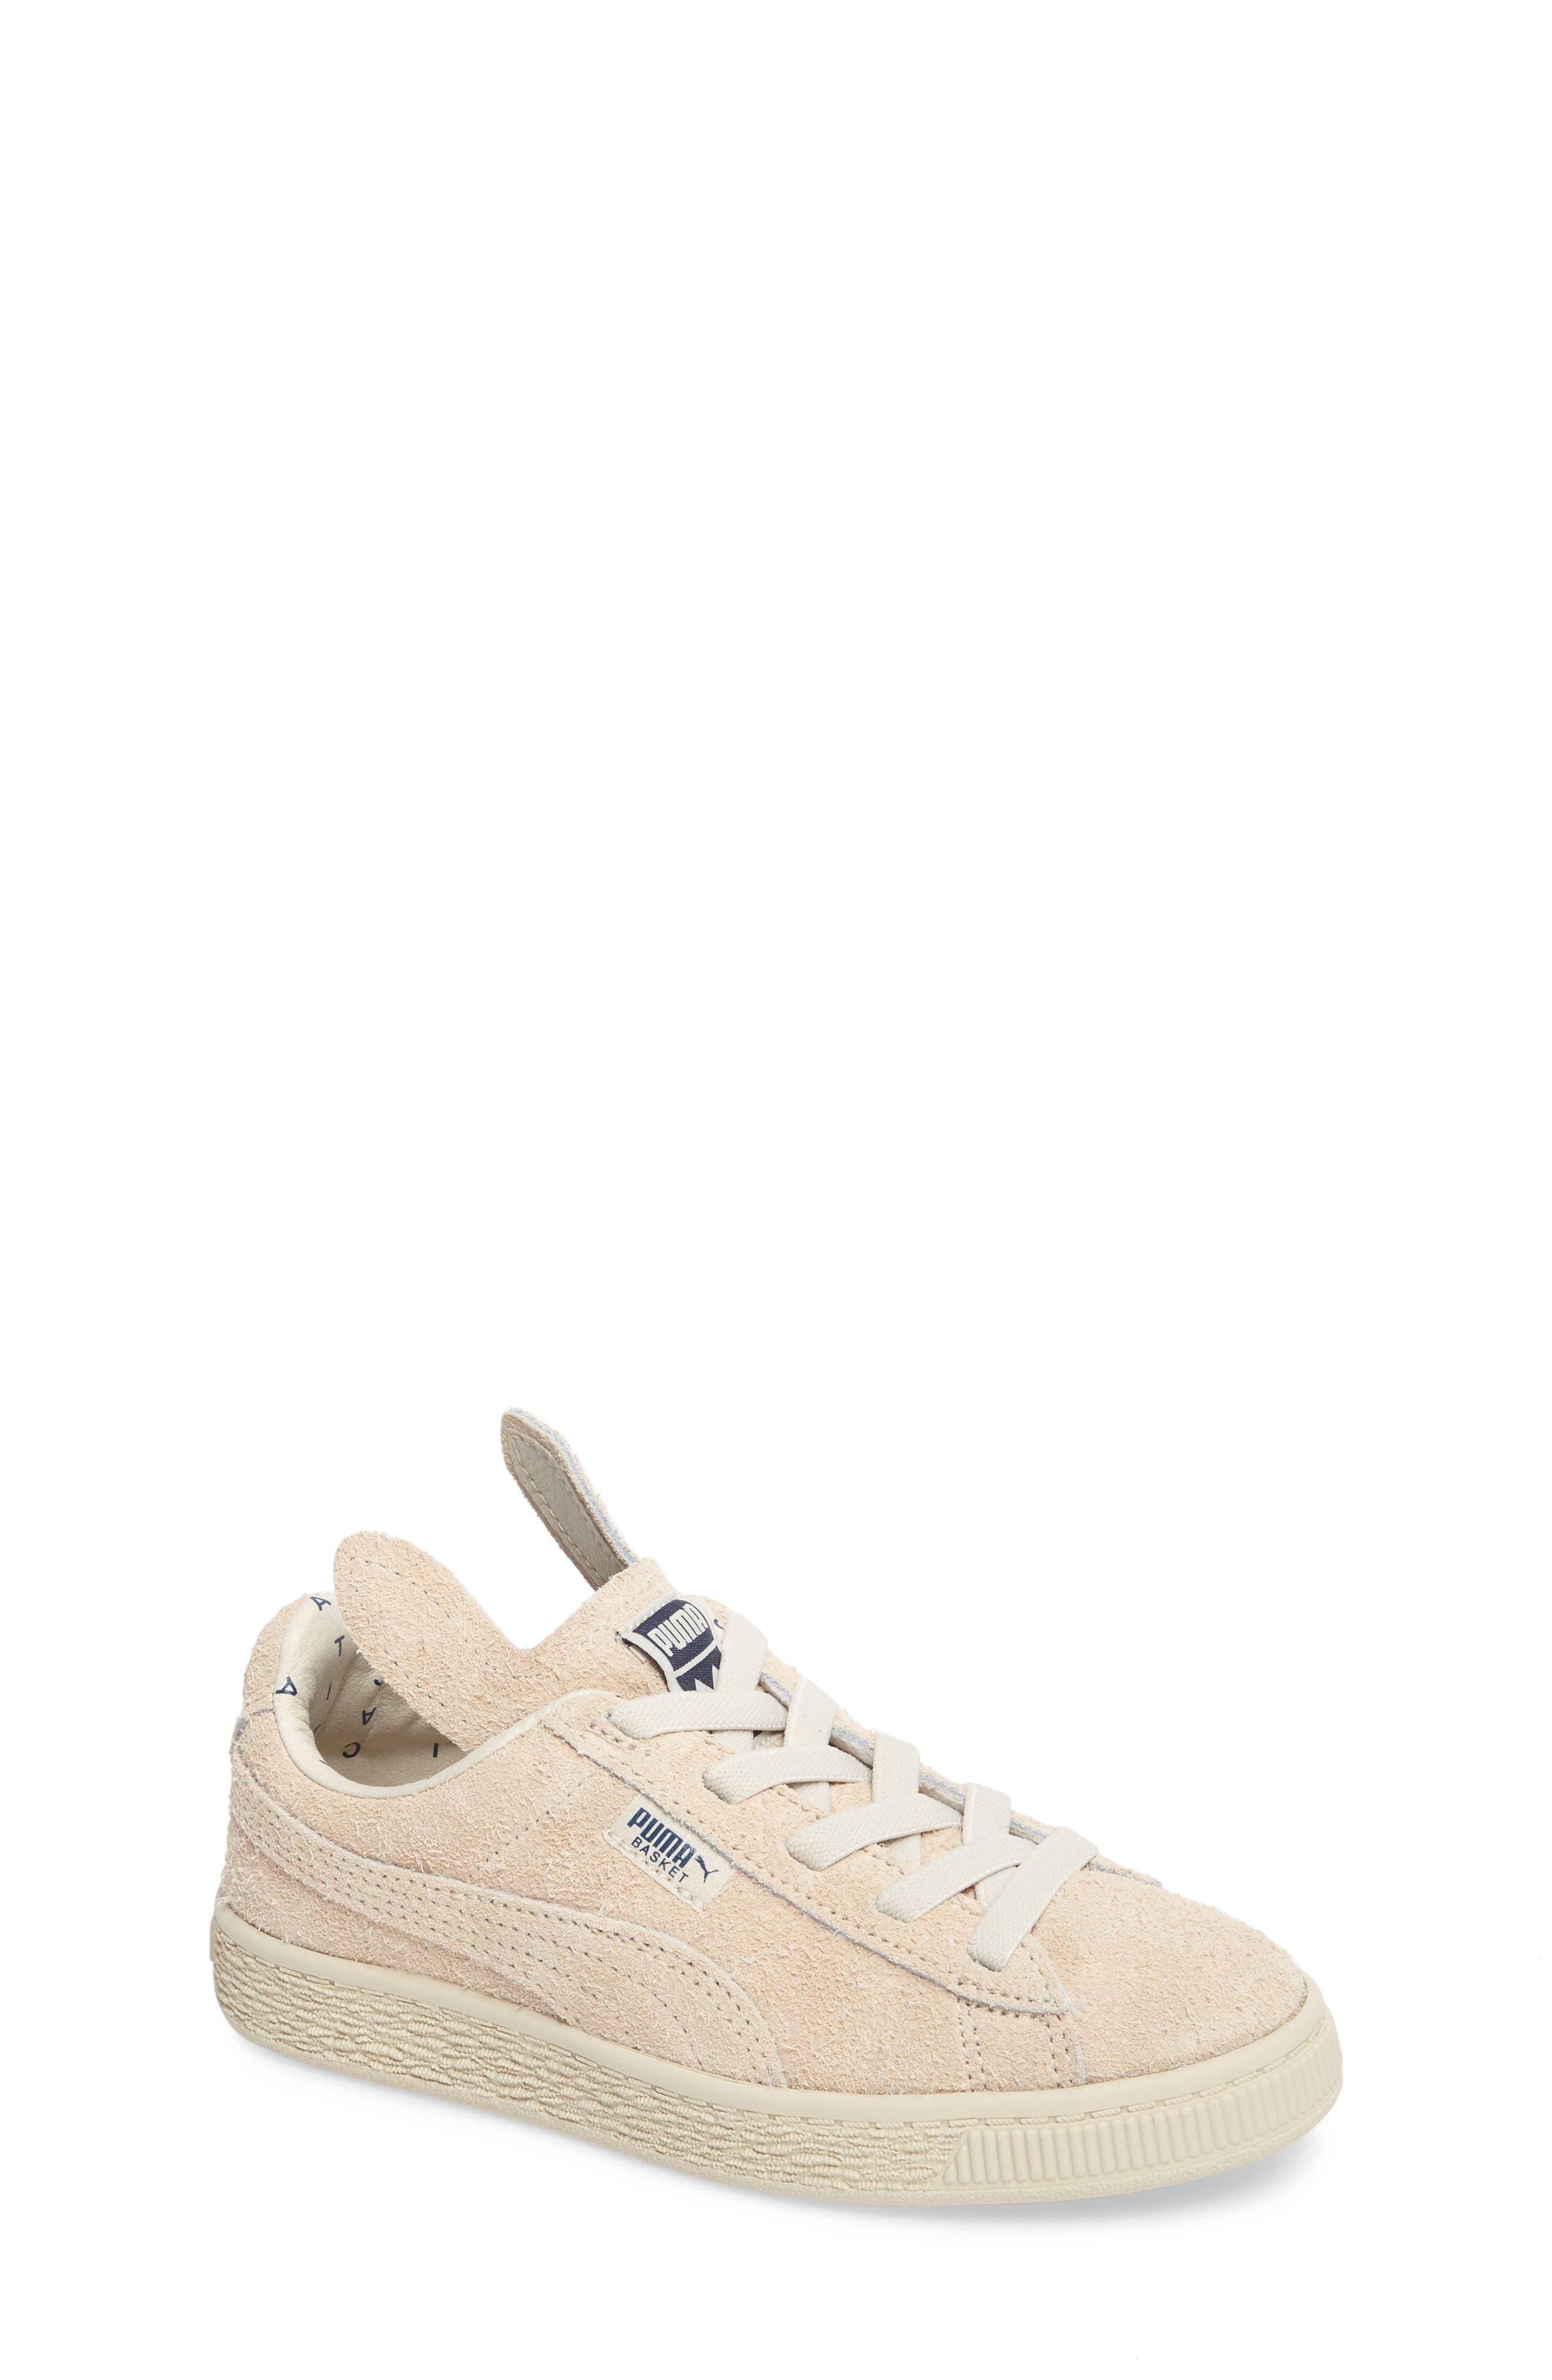 x tinycottons Basket Furry Sneaker,                         Main,                         color, Birch/ Dress Blues